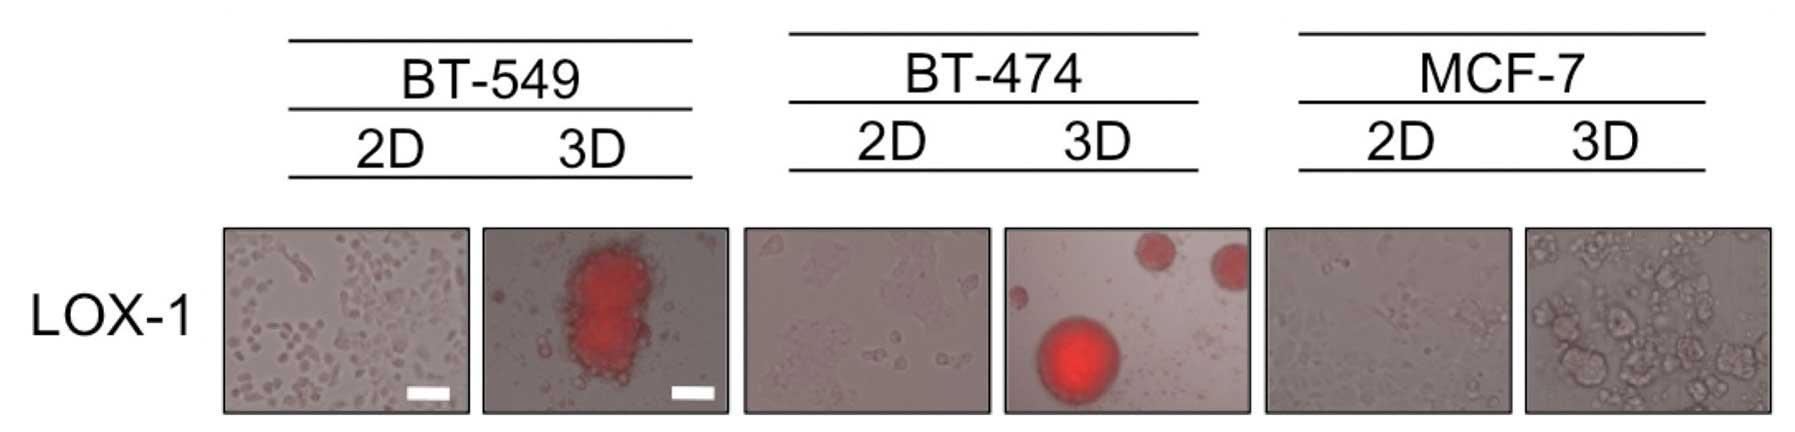 Comparison of 2D- and 3D-culture models as drug-testing platforms ...